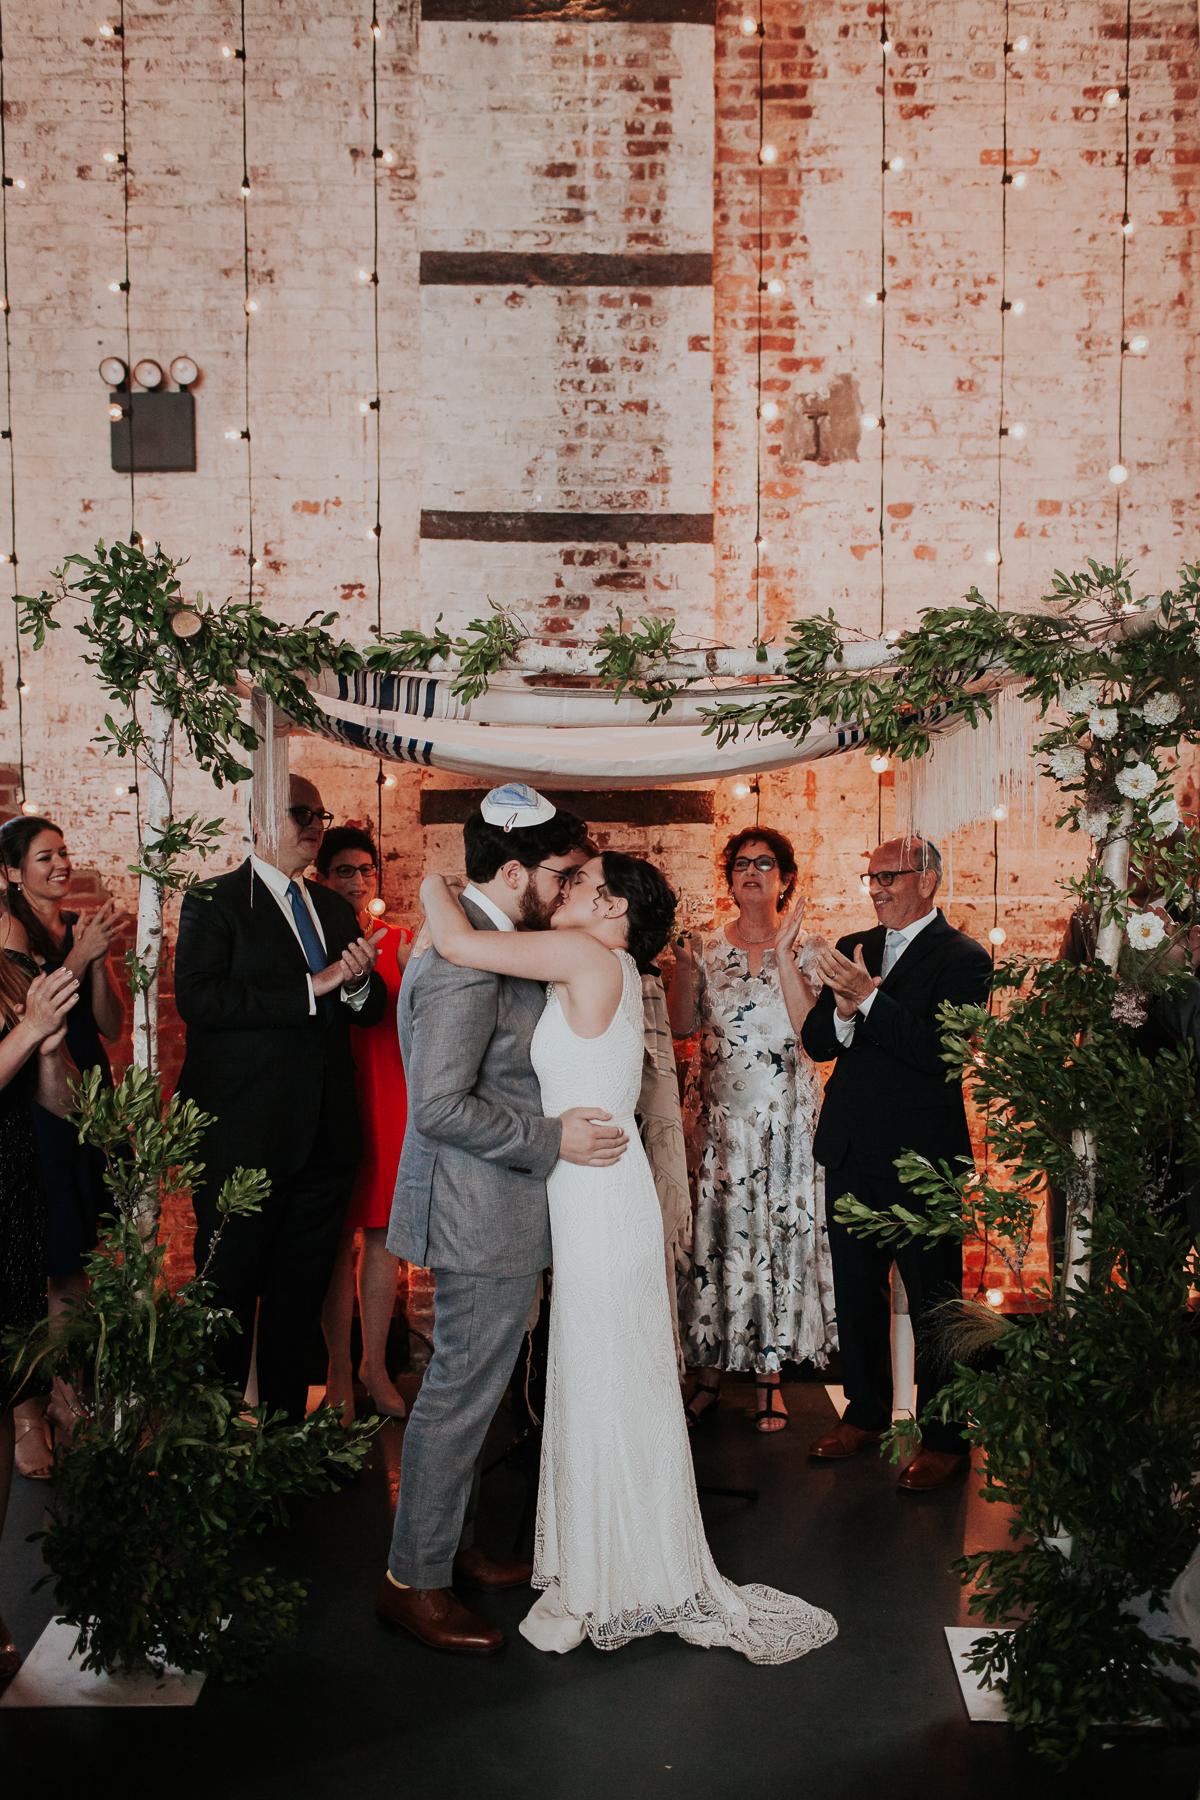 The-Green-Building-Jewish-Wedding-NYC-Brooklyn-Documentary-Wedding-Photographer-38.jpg